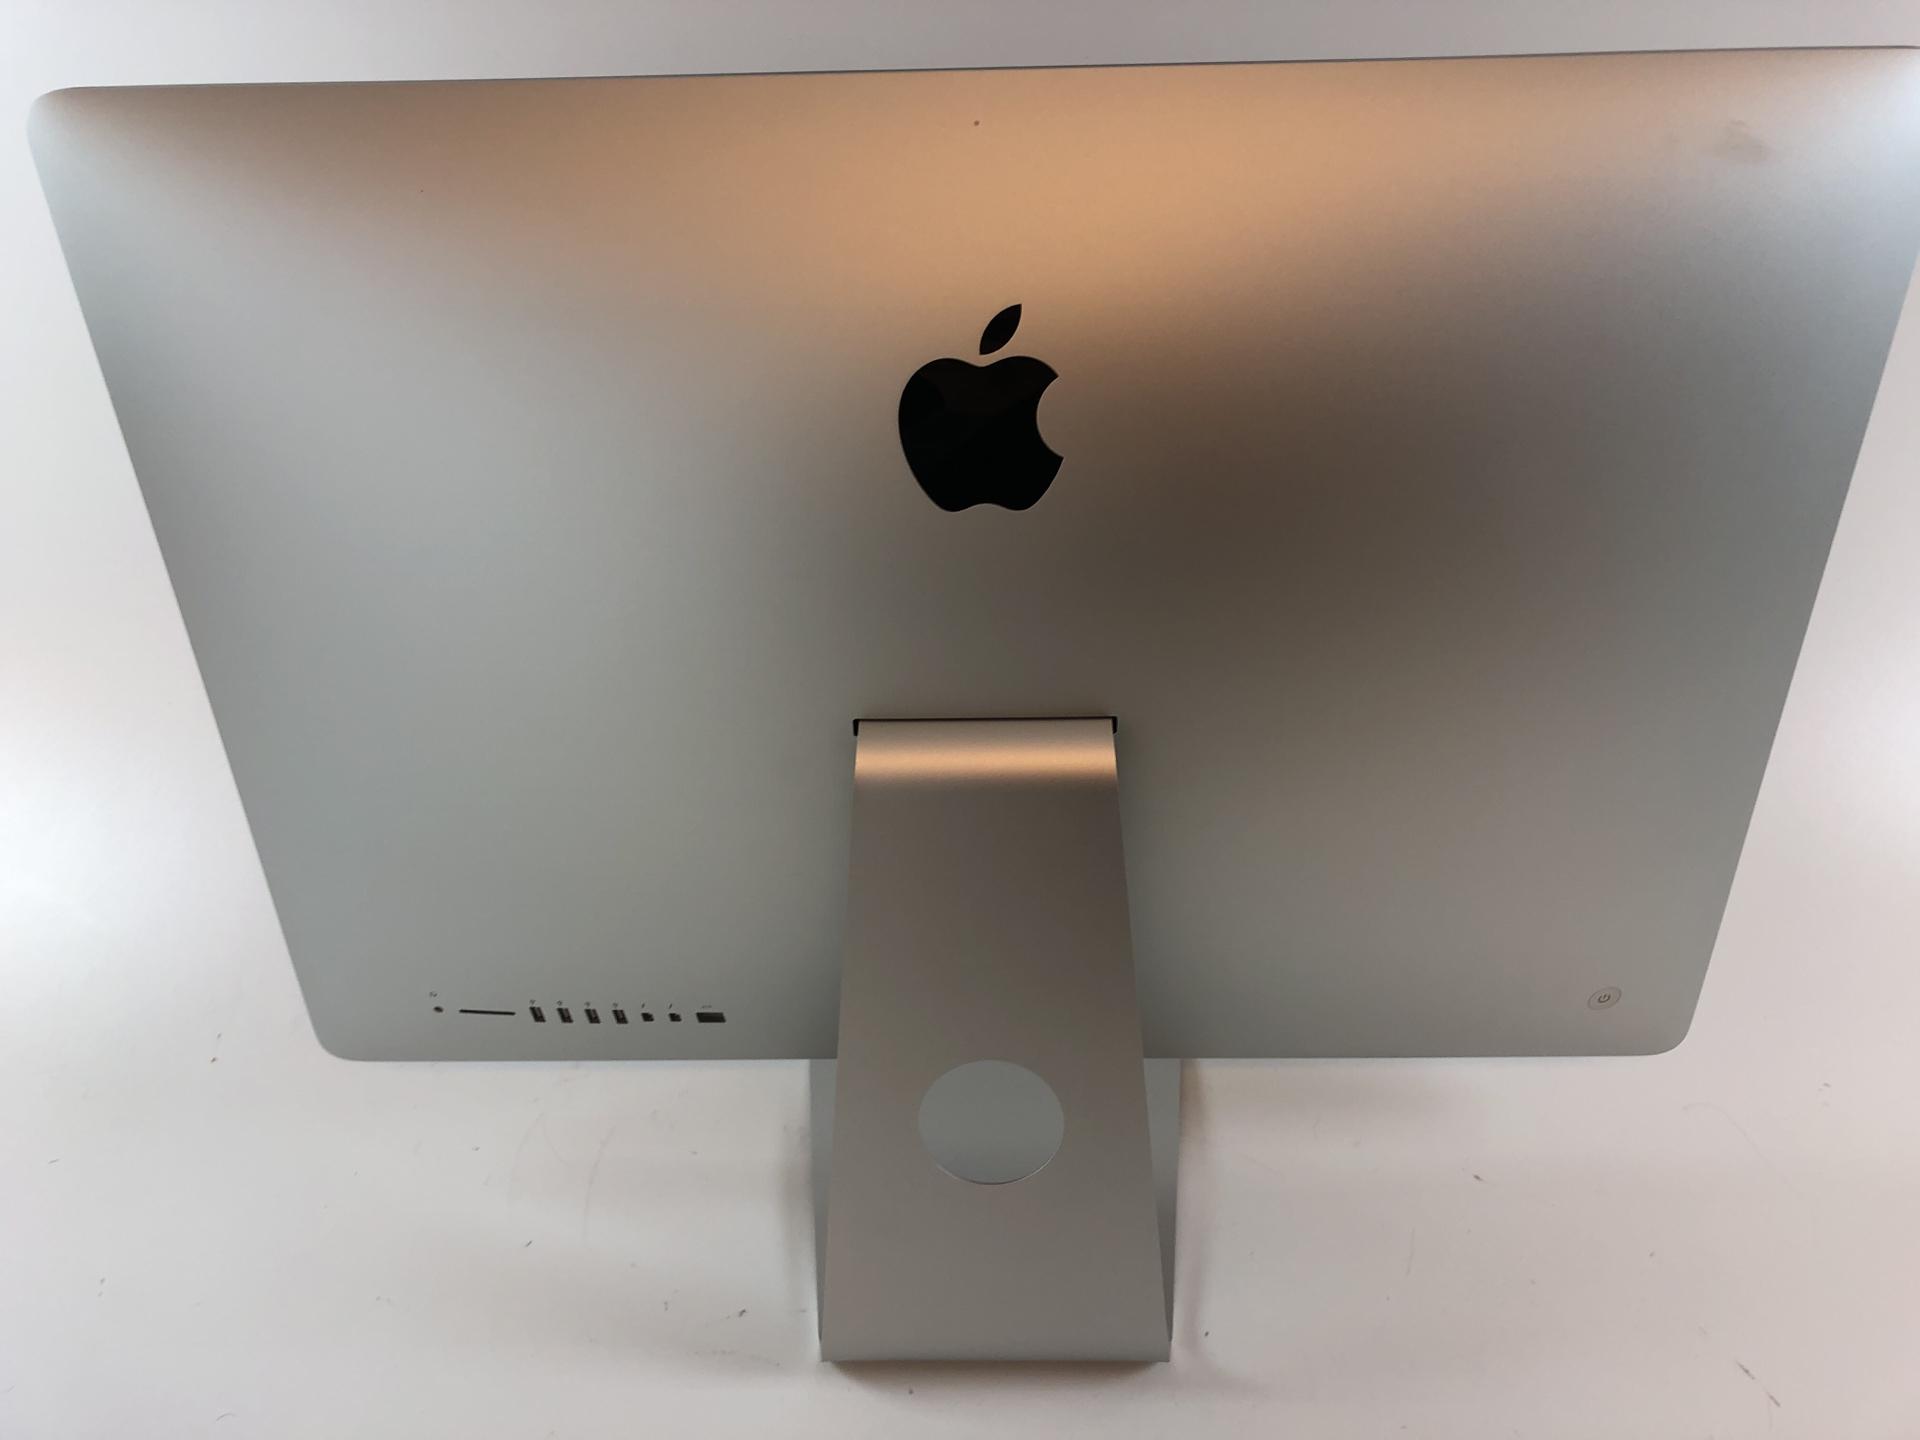 "iMac 27"" Late 2013 (Intel Quad-Core i5 3.2 GHz 16 GB RAM 1 TB HDD), Intel Quad-Core i5 3.2 GHz, 16 GB RAM, 1 TB HDD, Bild 2"